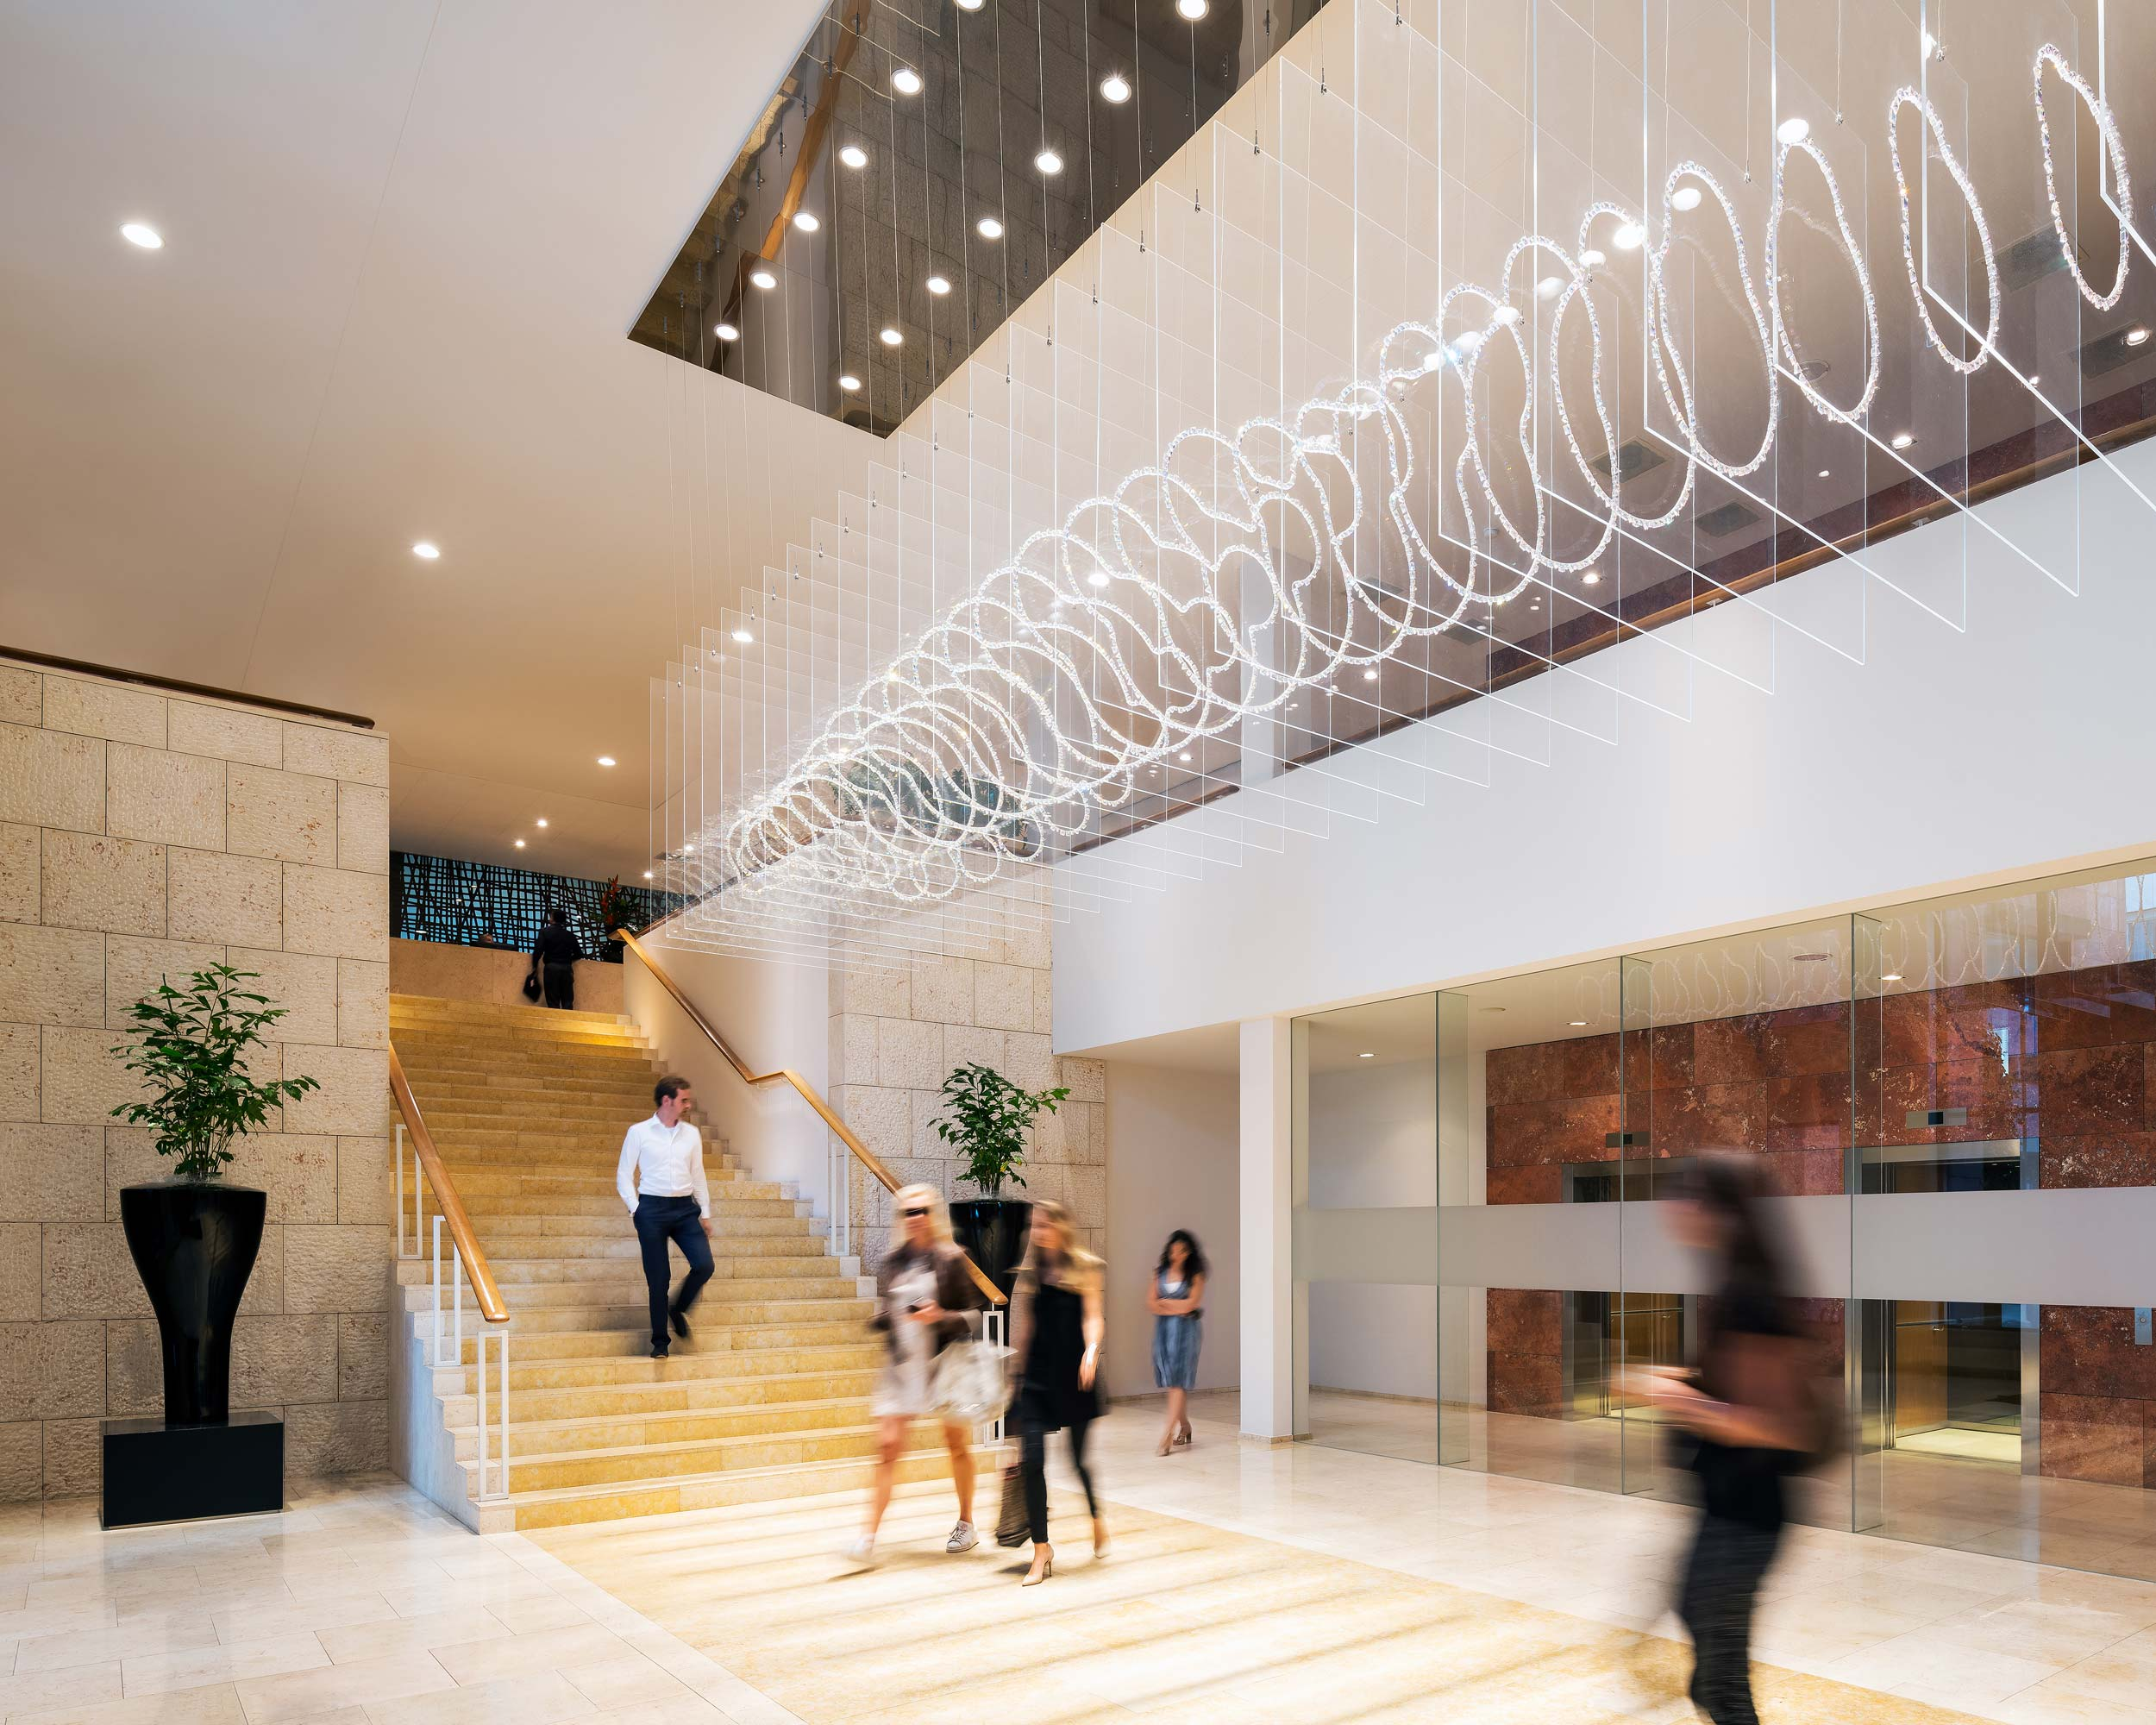 Baker McKenzie kantoor interieur, Amsterdam - Interieurfotograaf Chiel de Nooyer